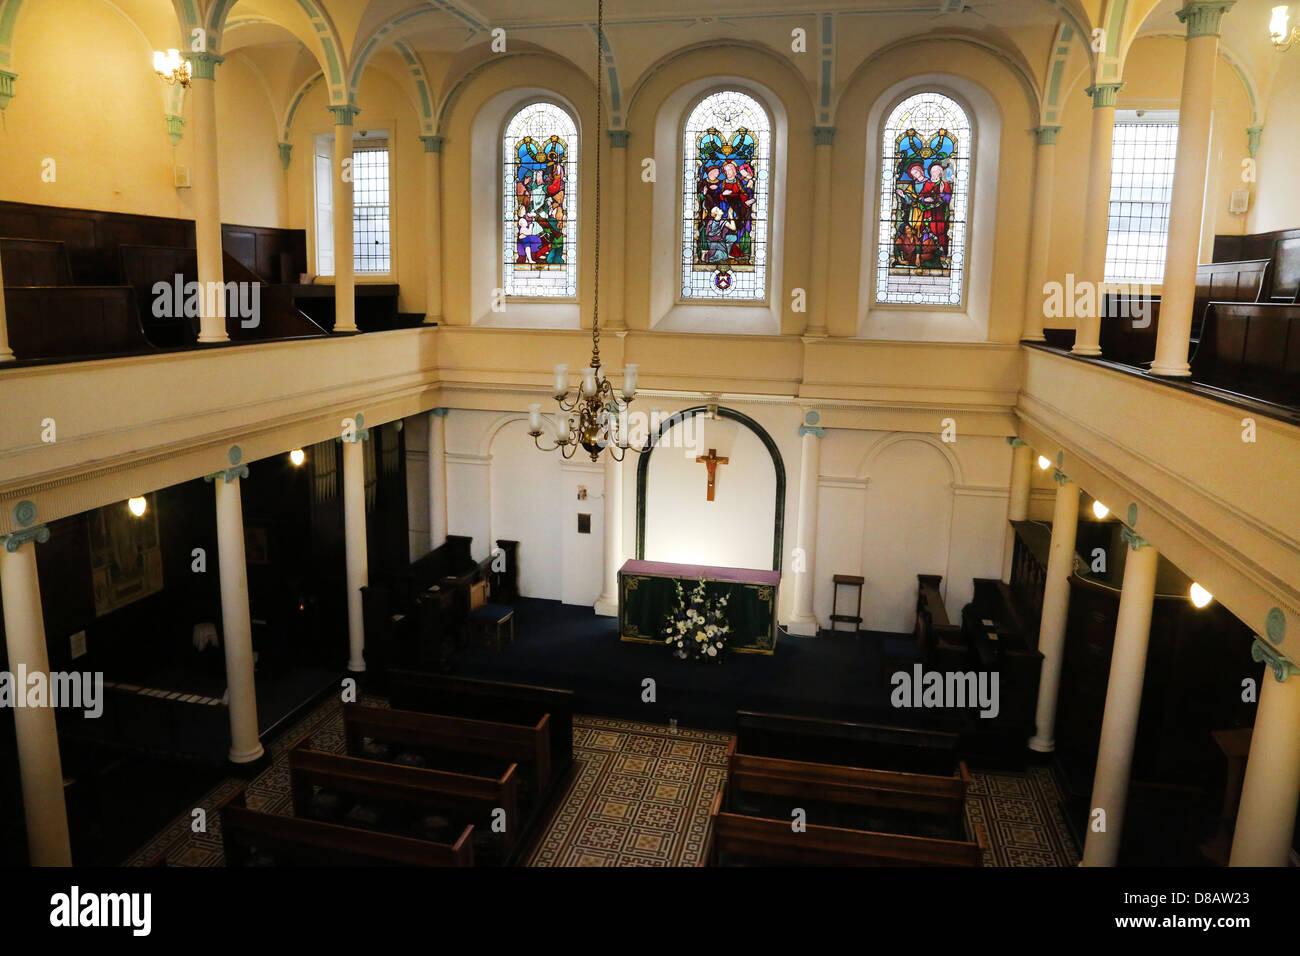 Southwark London England 18th Century Guy's Chapel The Altar - Stock Image